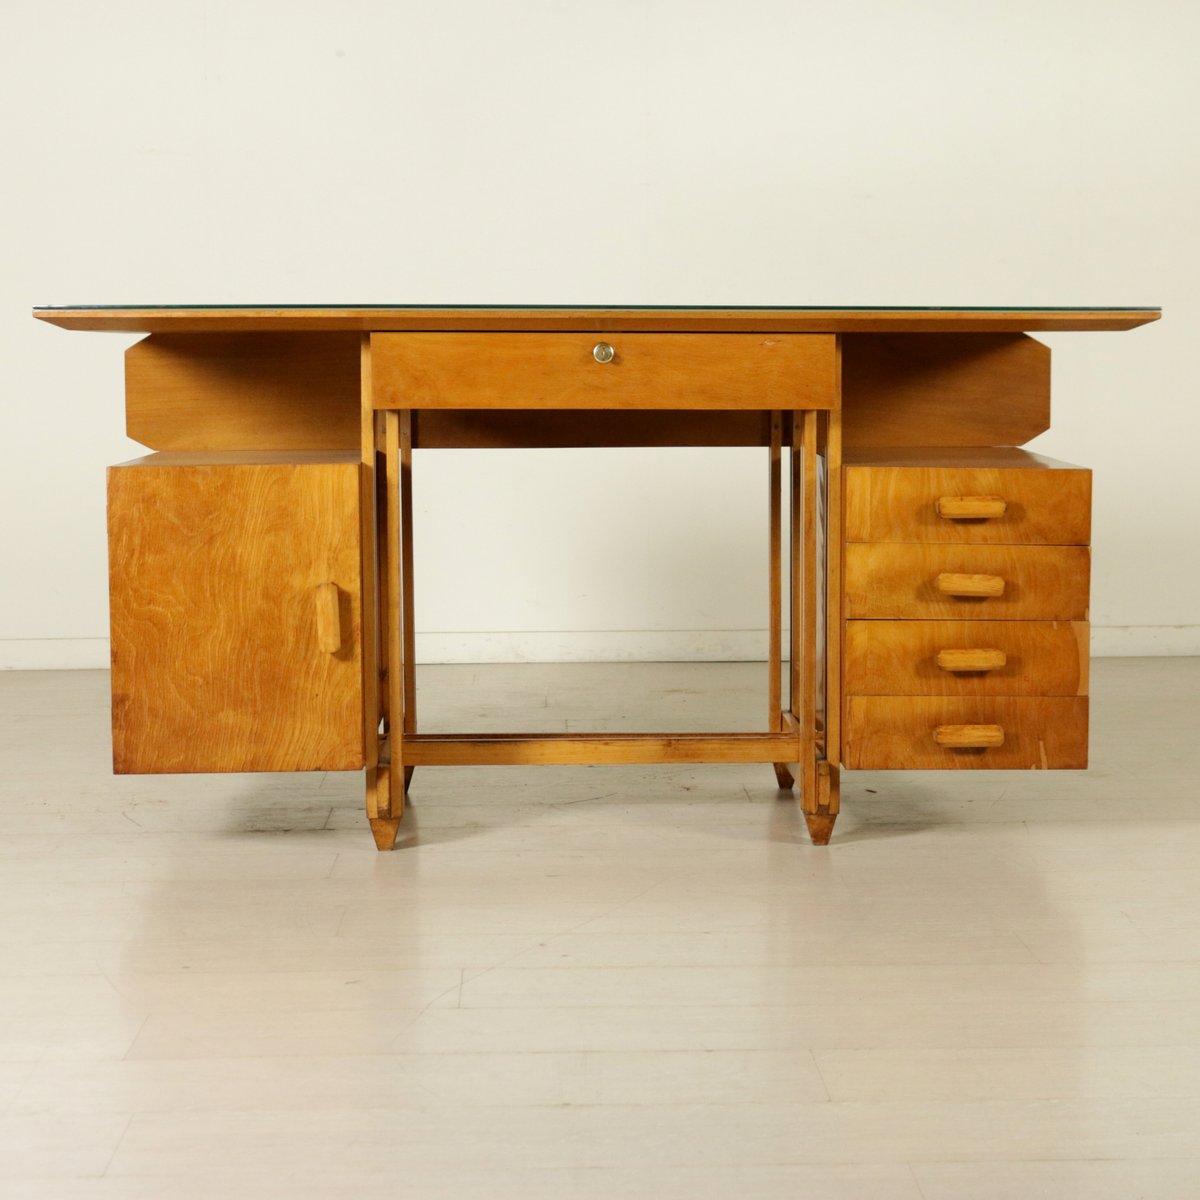 bureau en contreplaqu de bouleau avec plateau en verre. Black Bedroom Furniture Sets. Home Design Ideas